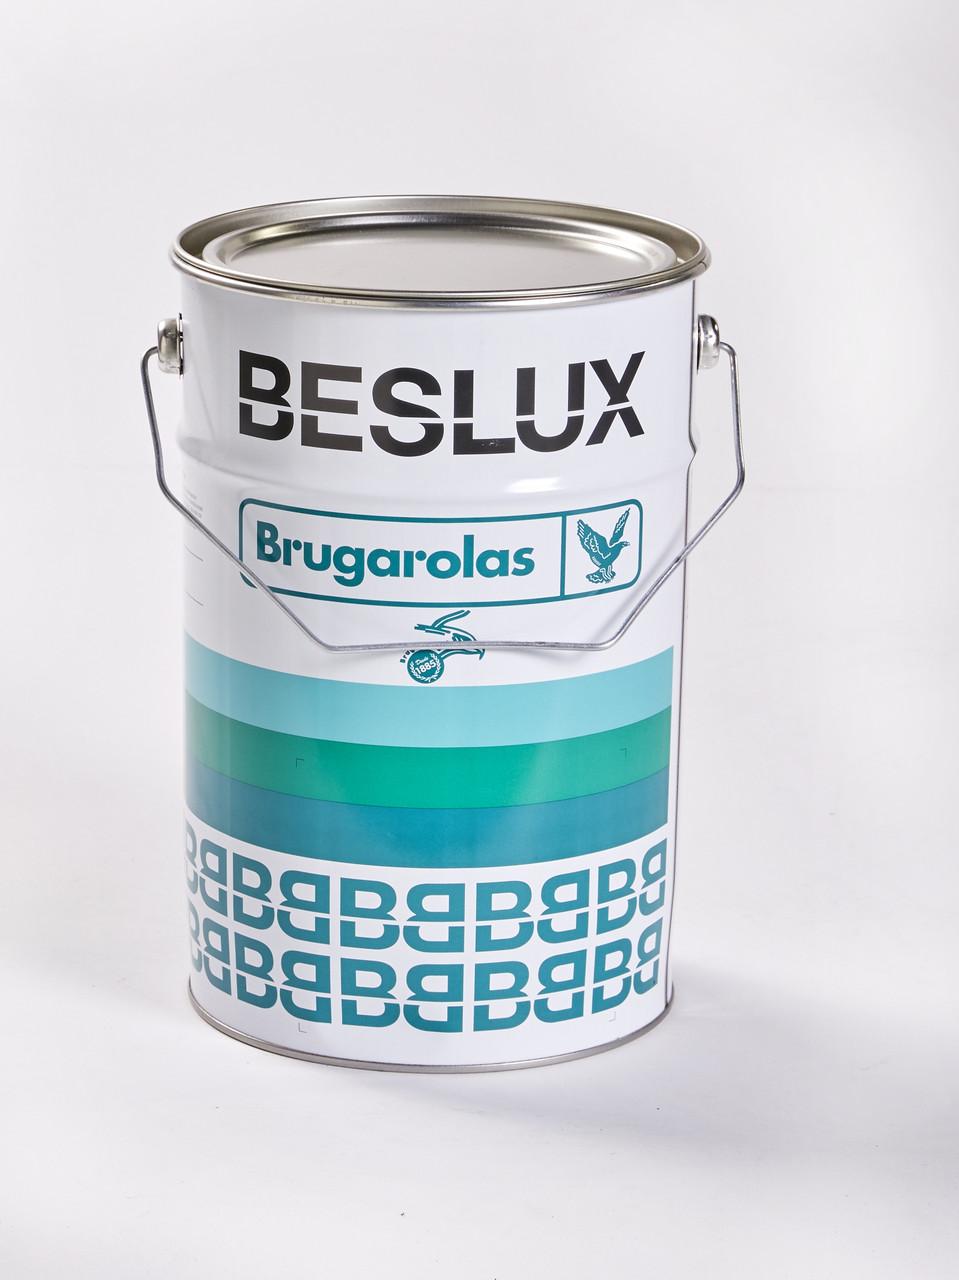 Cмазка для пищевой промышленности G. BESLUX SULPLEX FG 2212 (ведро 5 кг)